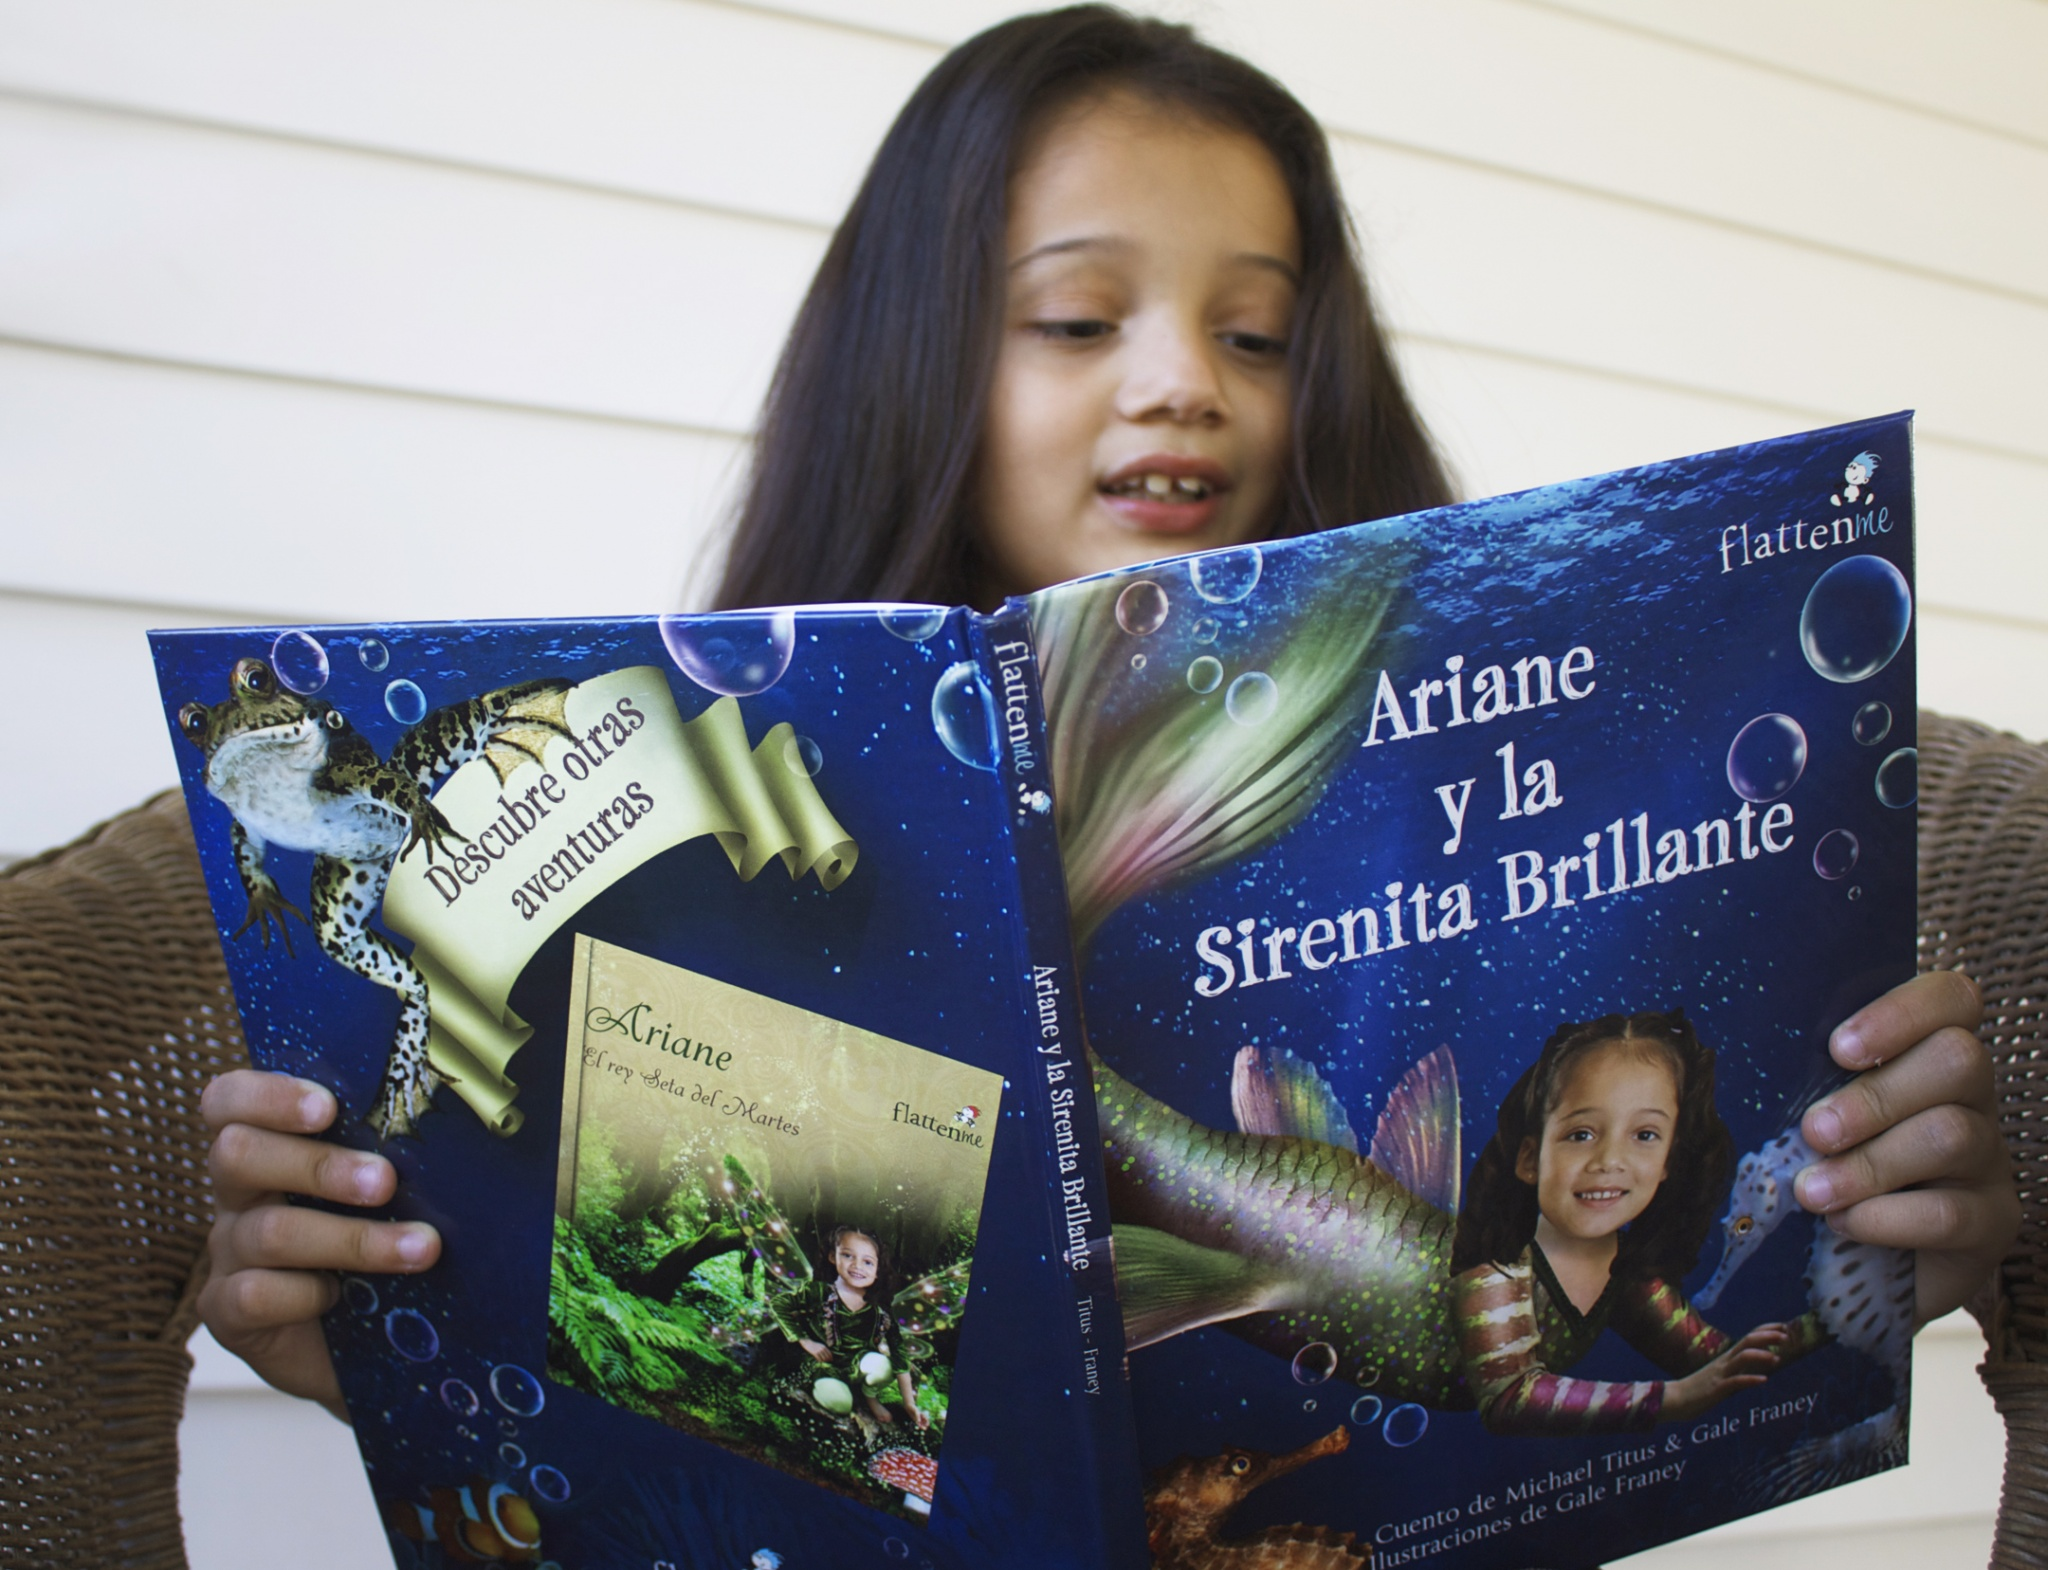 Flattenme Personalized books Spanish